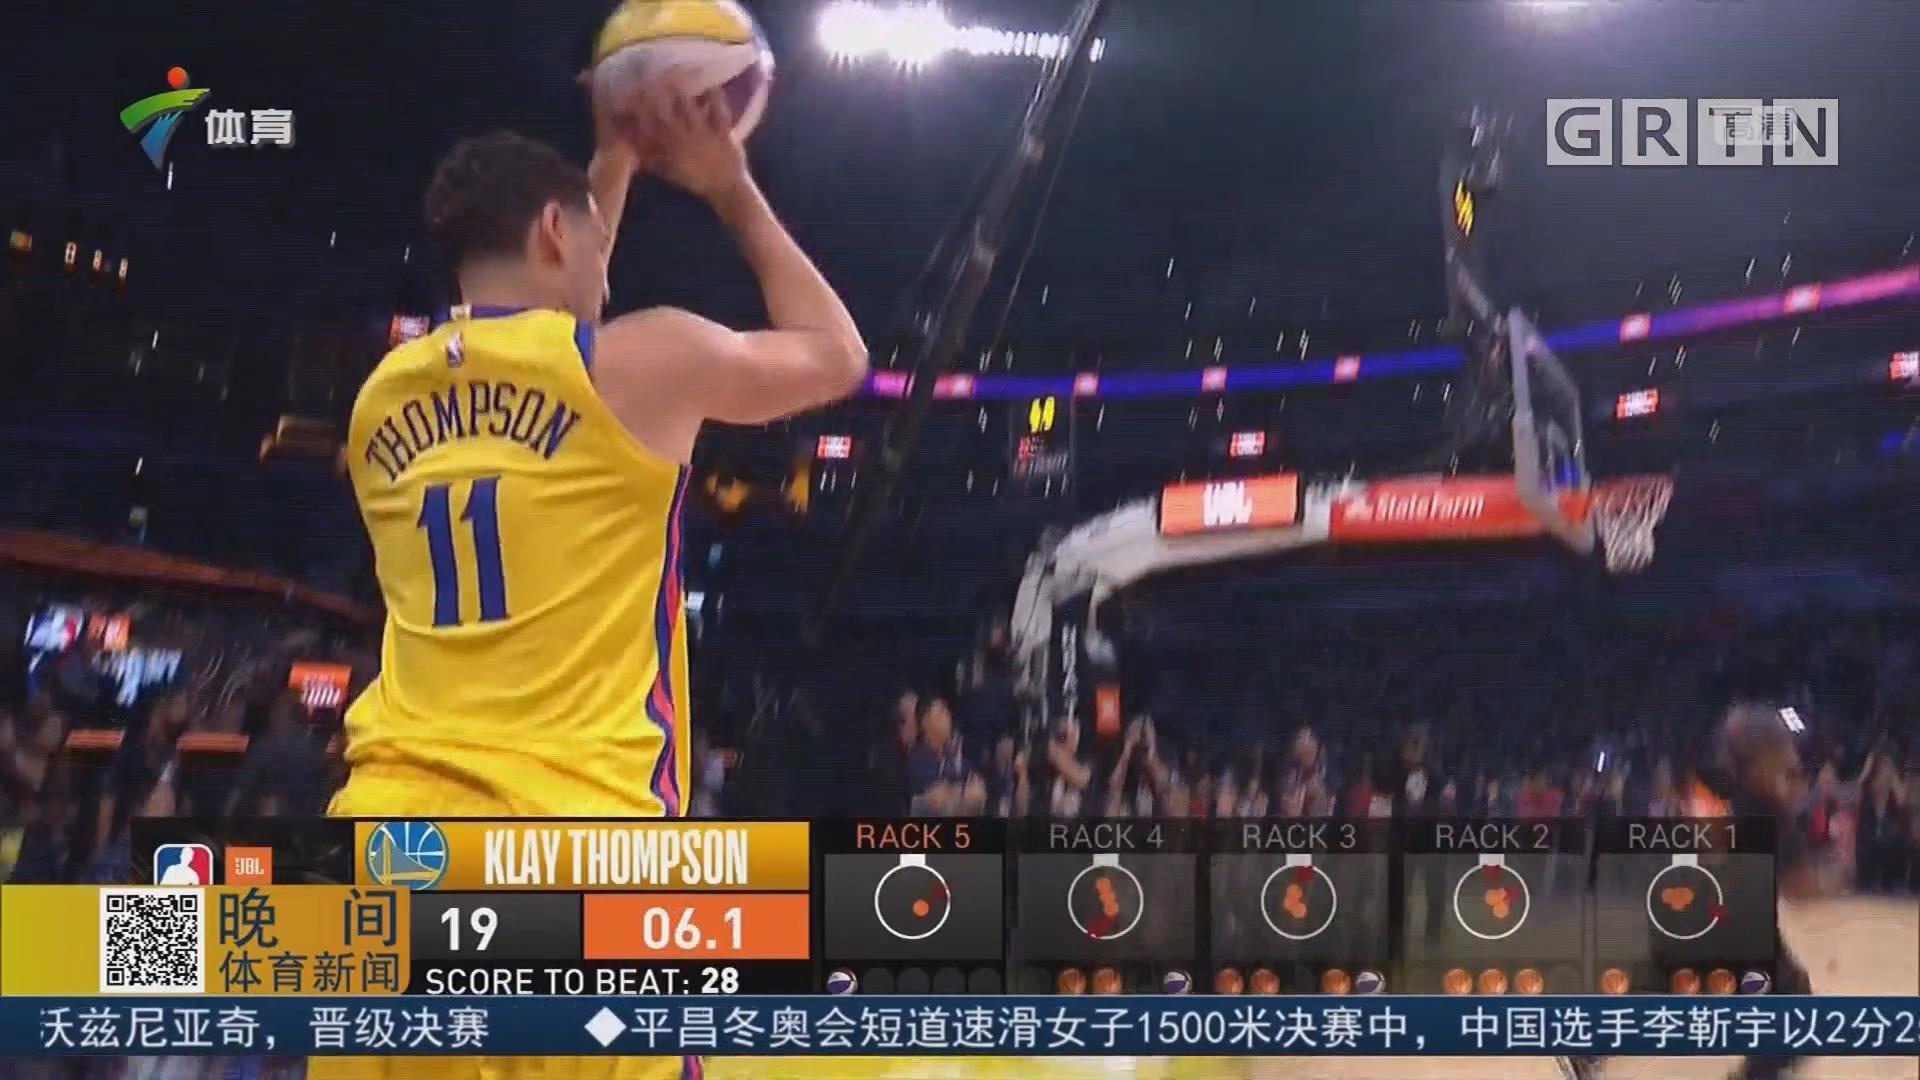 NBA全明星周末 米切尔勇夺扣篮王